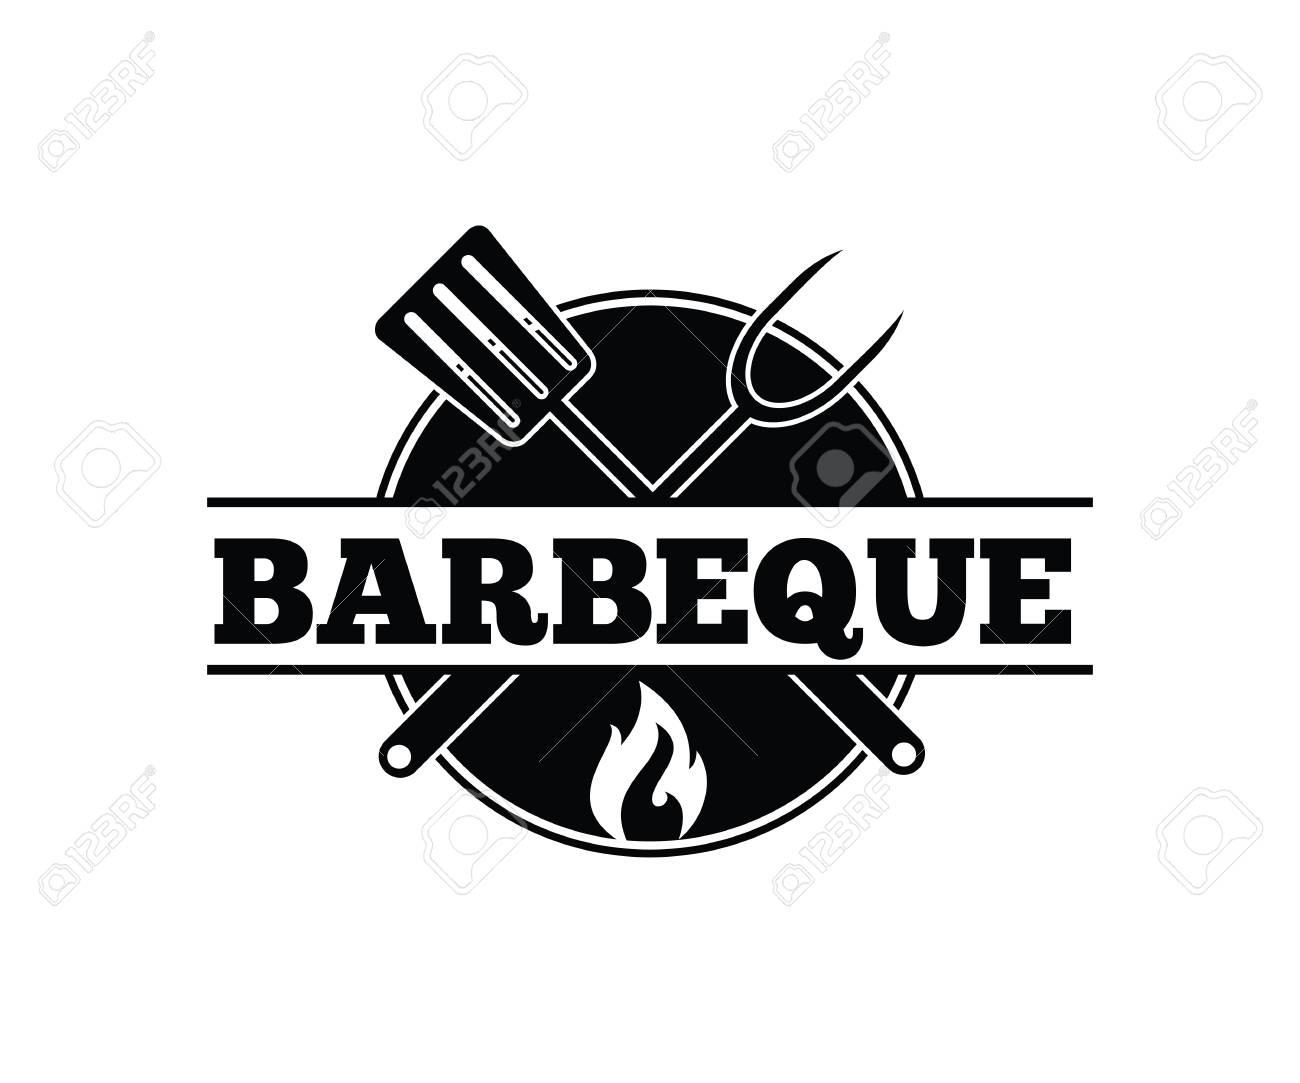 BBQ barbecue vector icon emblem logo design template - 103324226